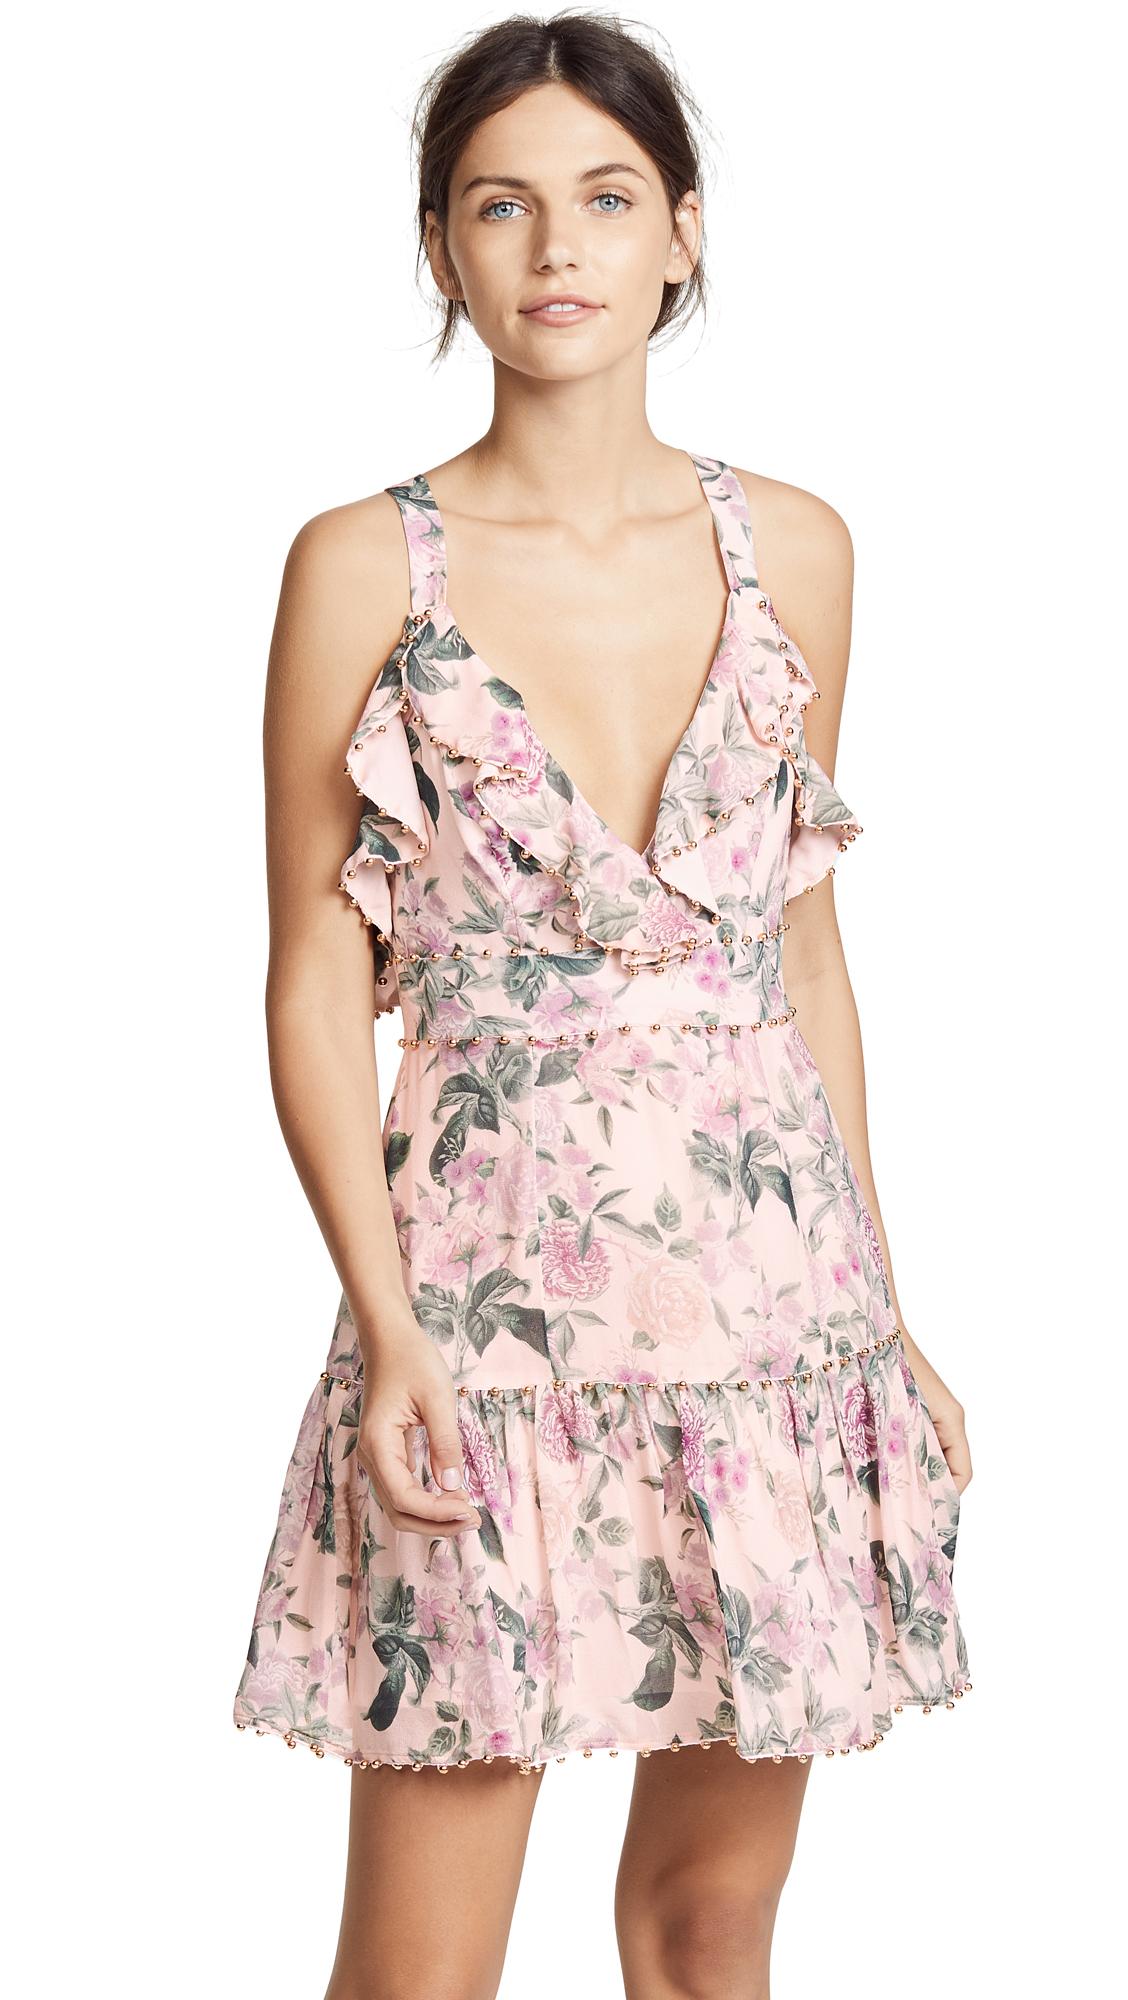 La Maison Talulah Floral Pleasure Mini Dress